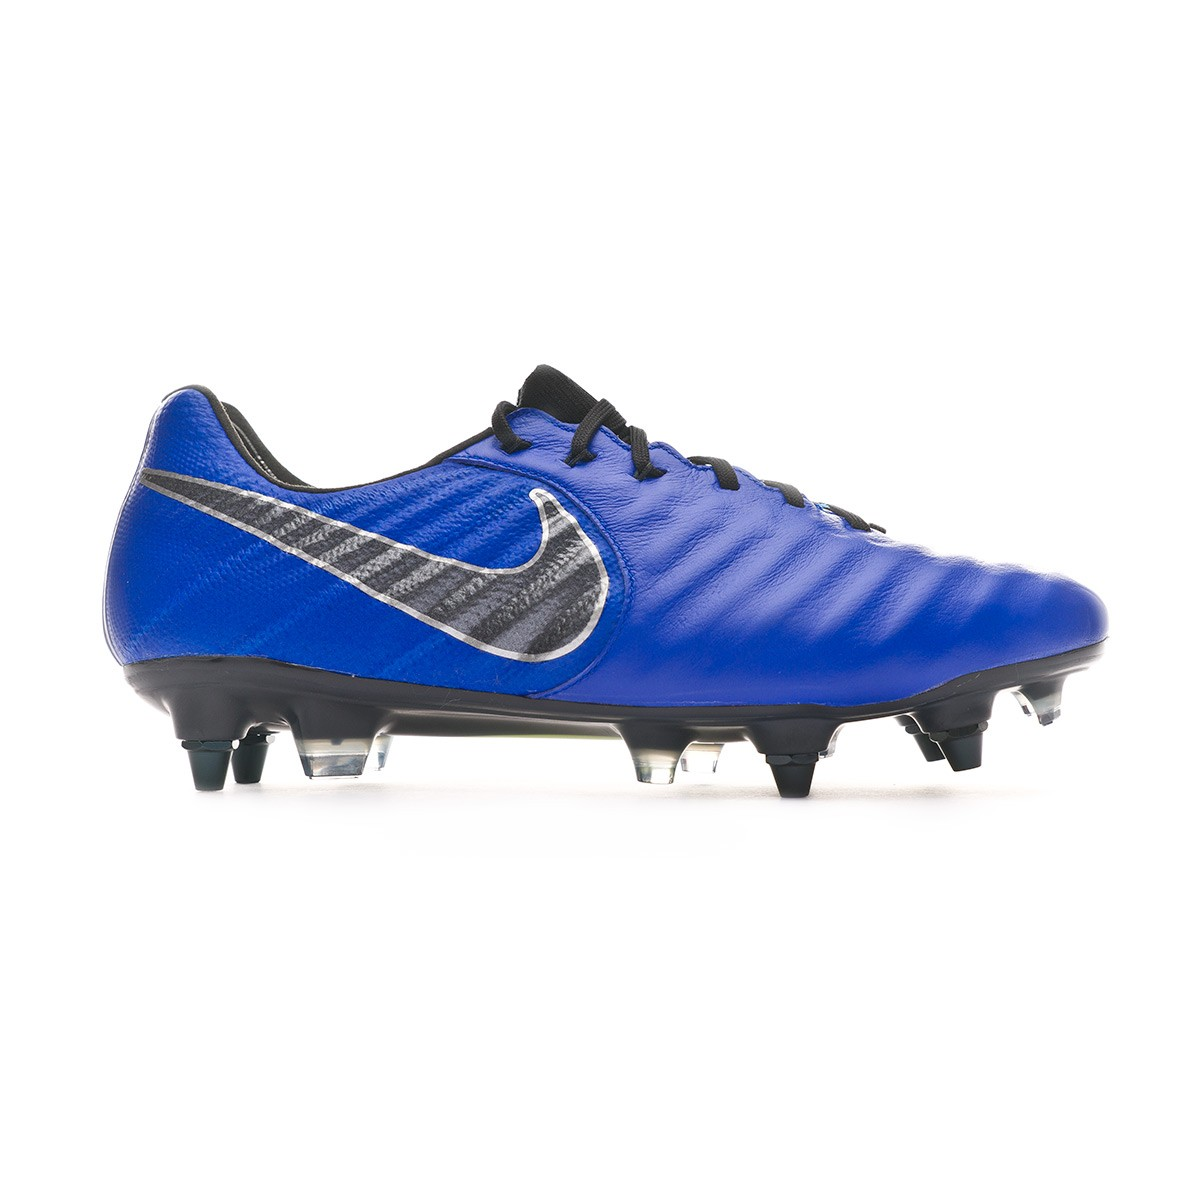 promo code 162a2 036a1 Chaussure de foot Nike Tiempo Legend VII Elite Anti-Clog SG-Pro Racer blue- Black-Metallic silver - Boutique de football Fútbol Emotion